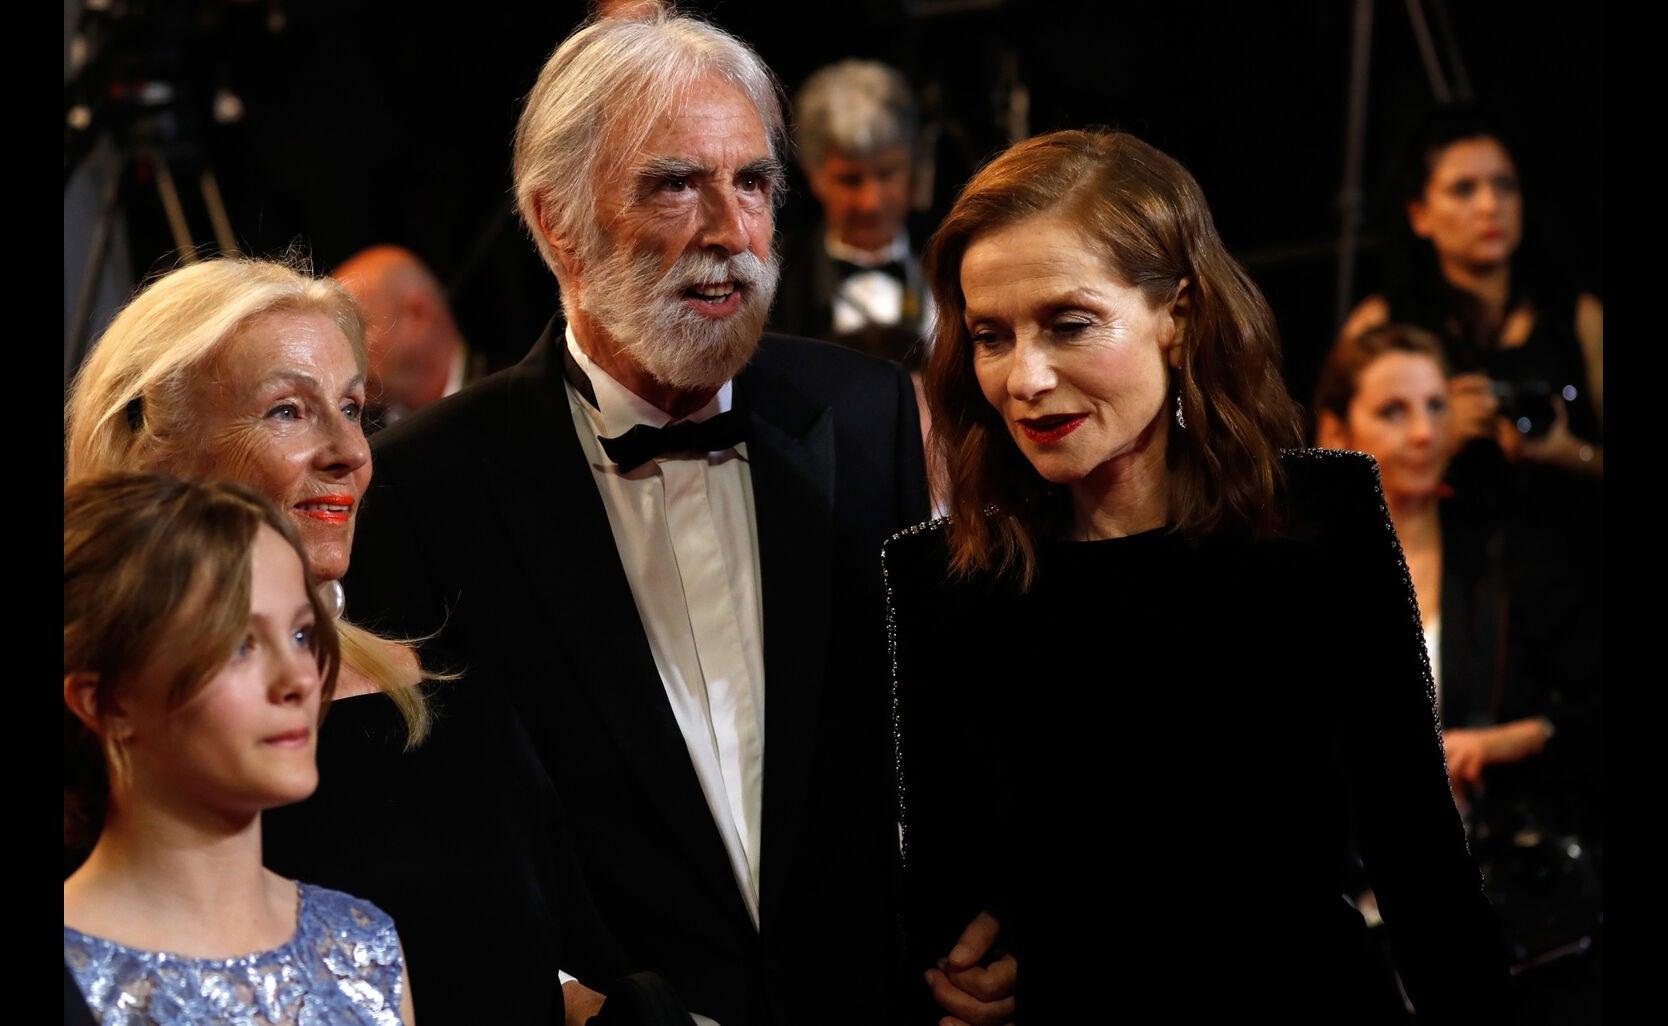 Fantine Harduin, Susi Haneke, director Michael Haneke and Isabelle Huppart